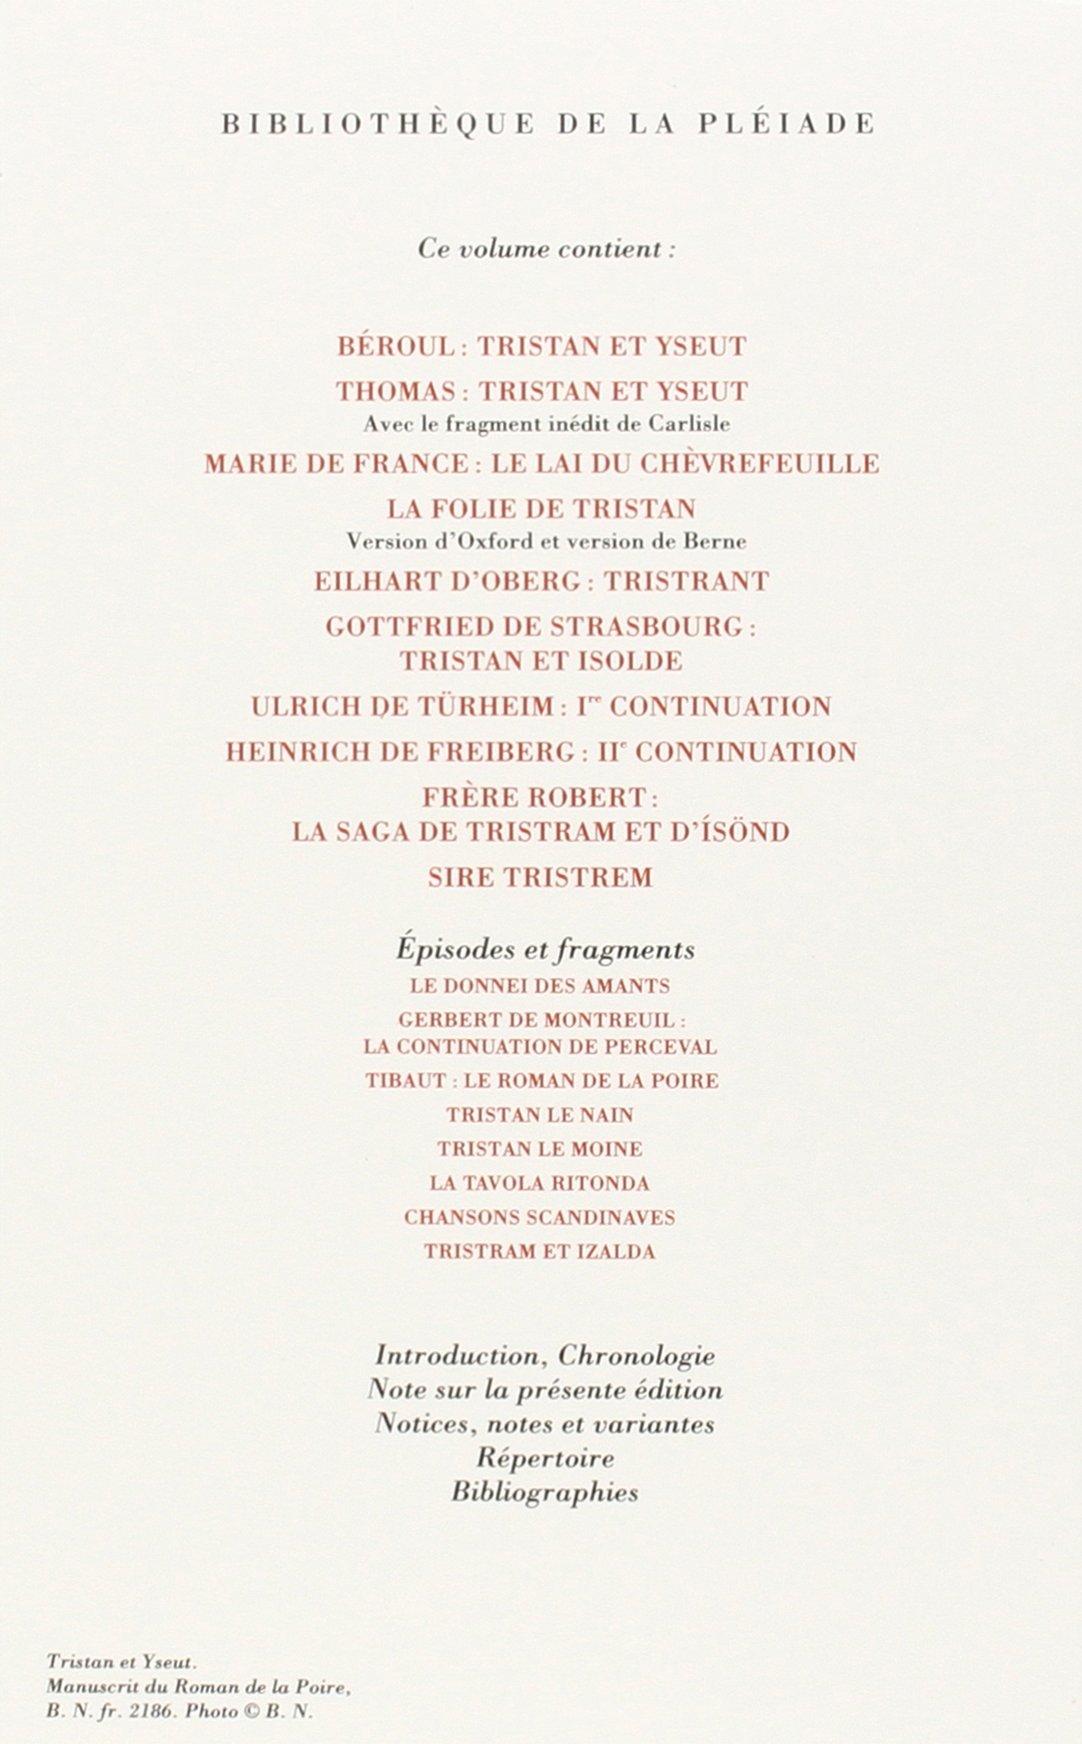 23 novembre 1995 Collectifs Gallimard 2070113353 TL2070113353 Tristan et Yseut Cuir//luxe